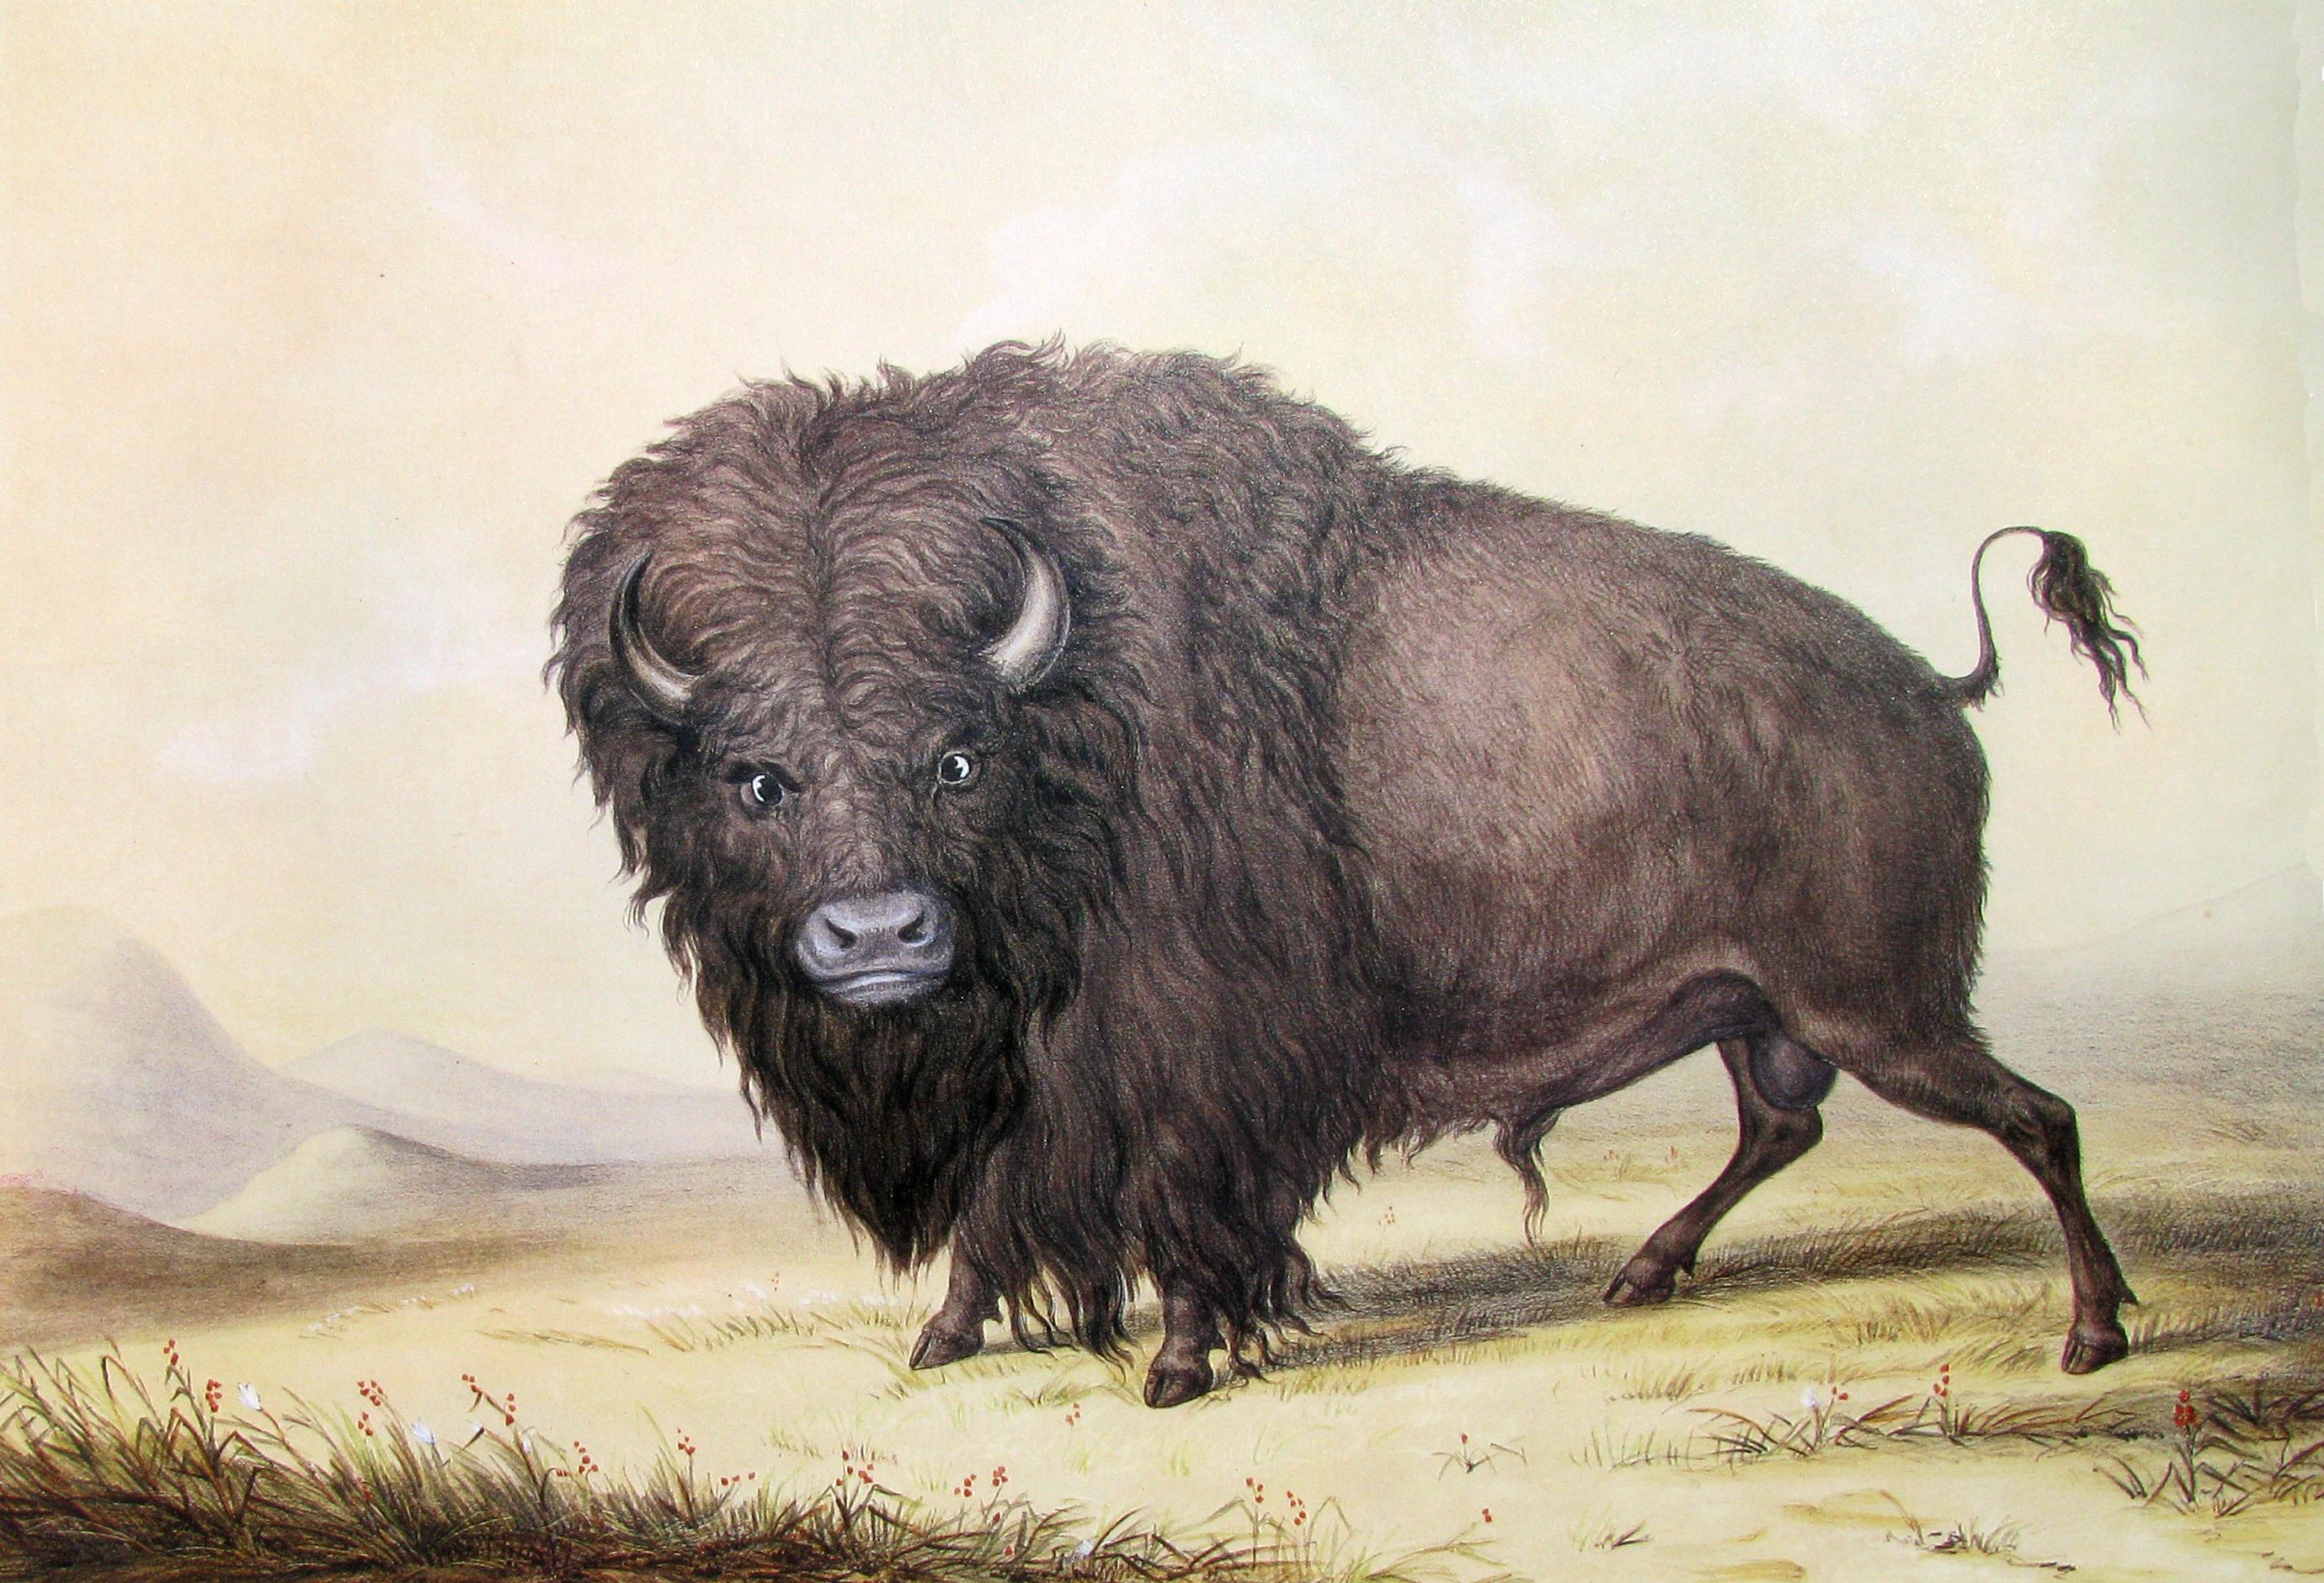 George_Catlin_Bull_Buffalo.JPG